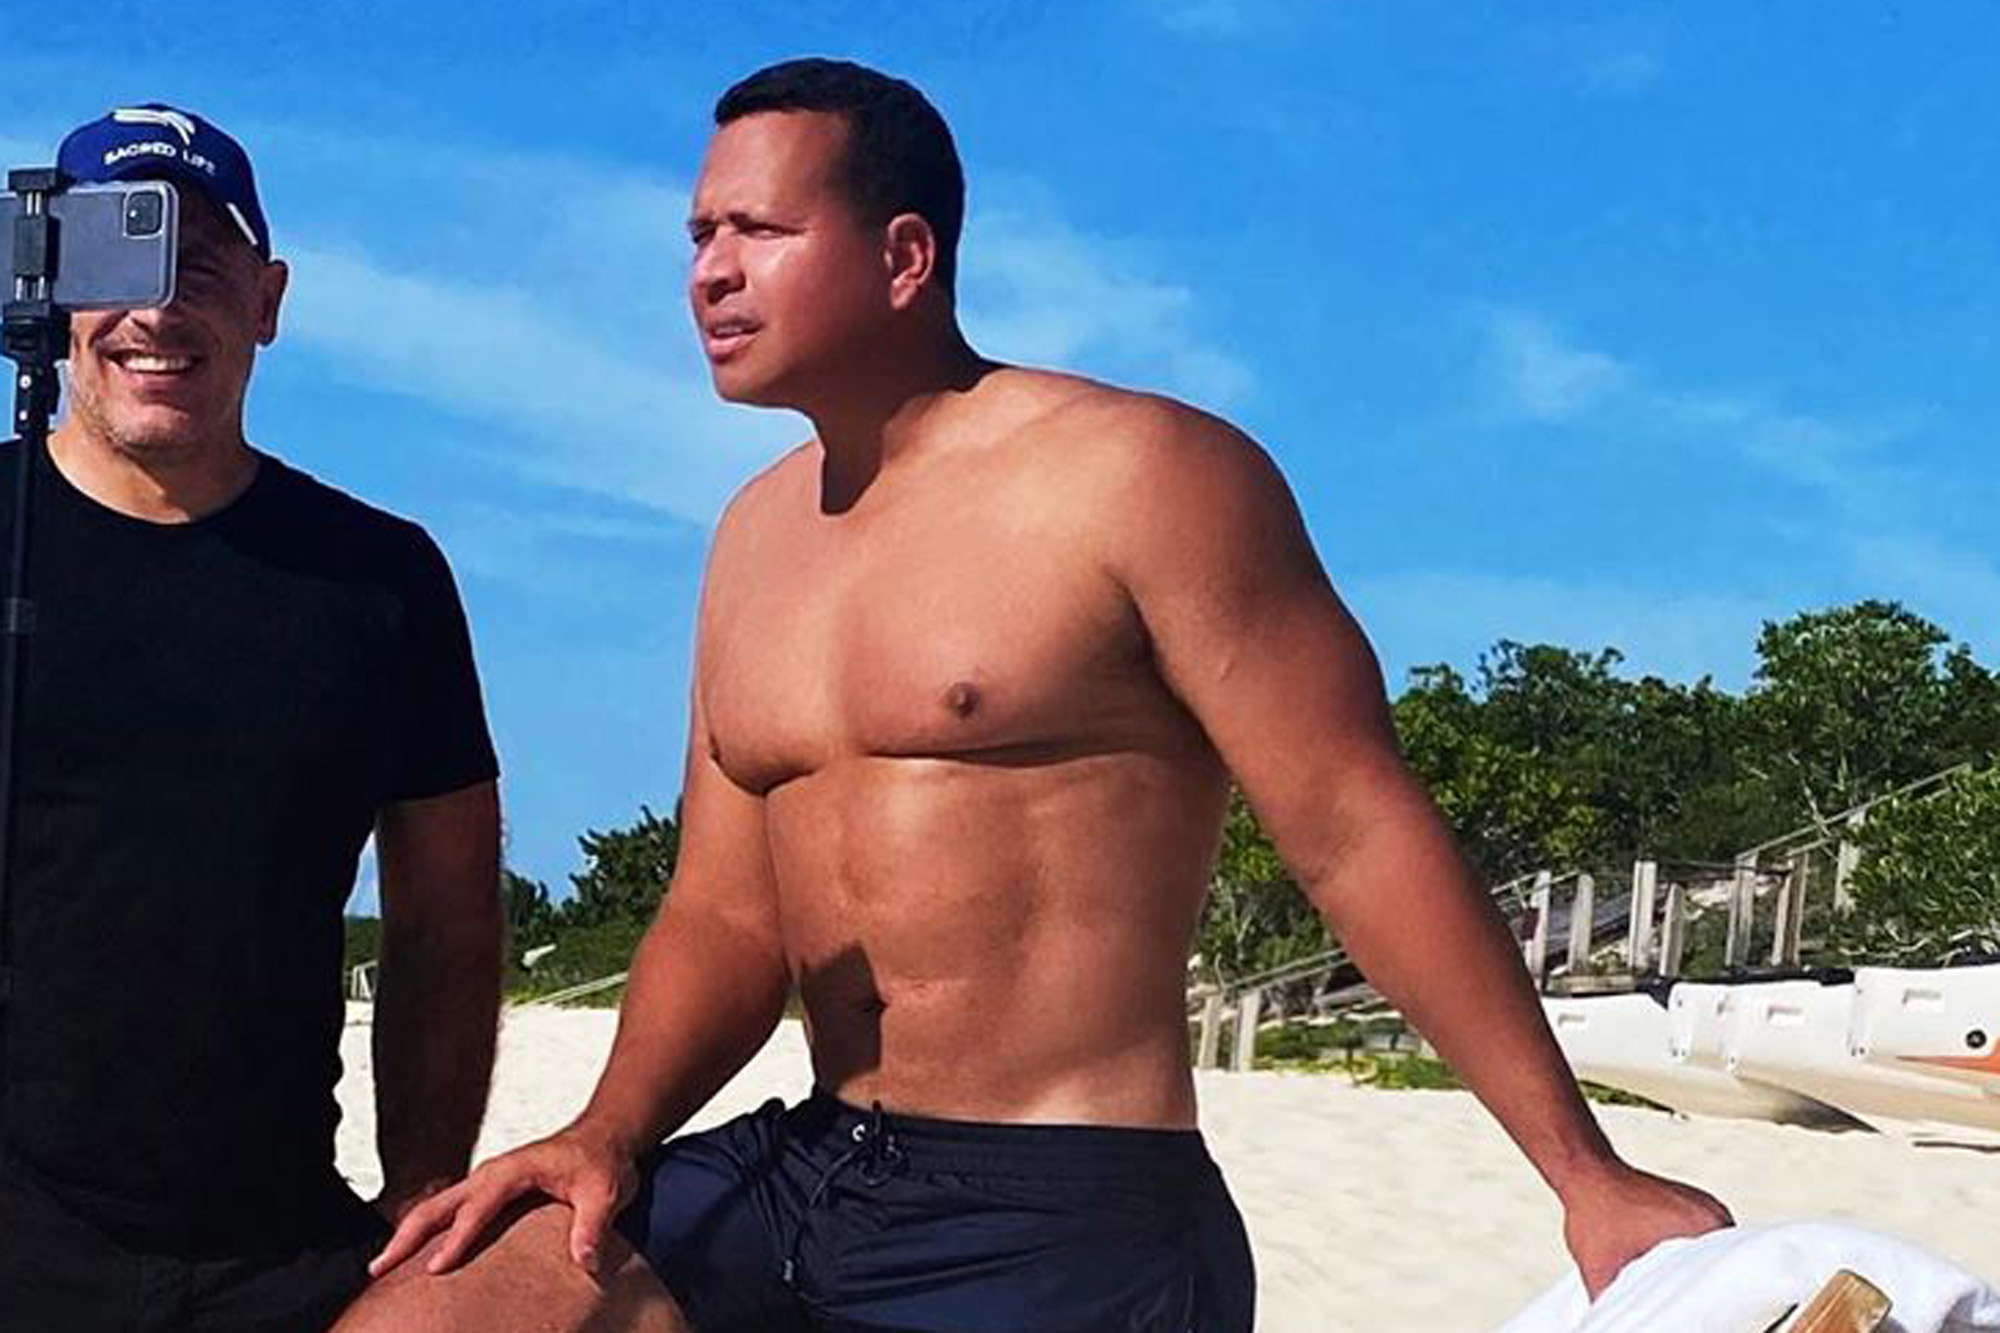 shirtless male celebs - Alex Rodriguez